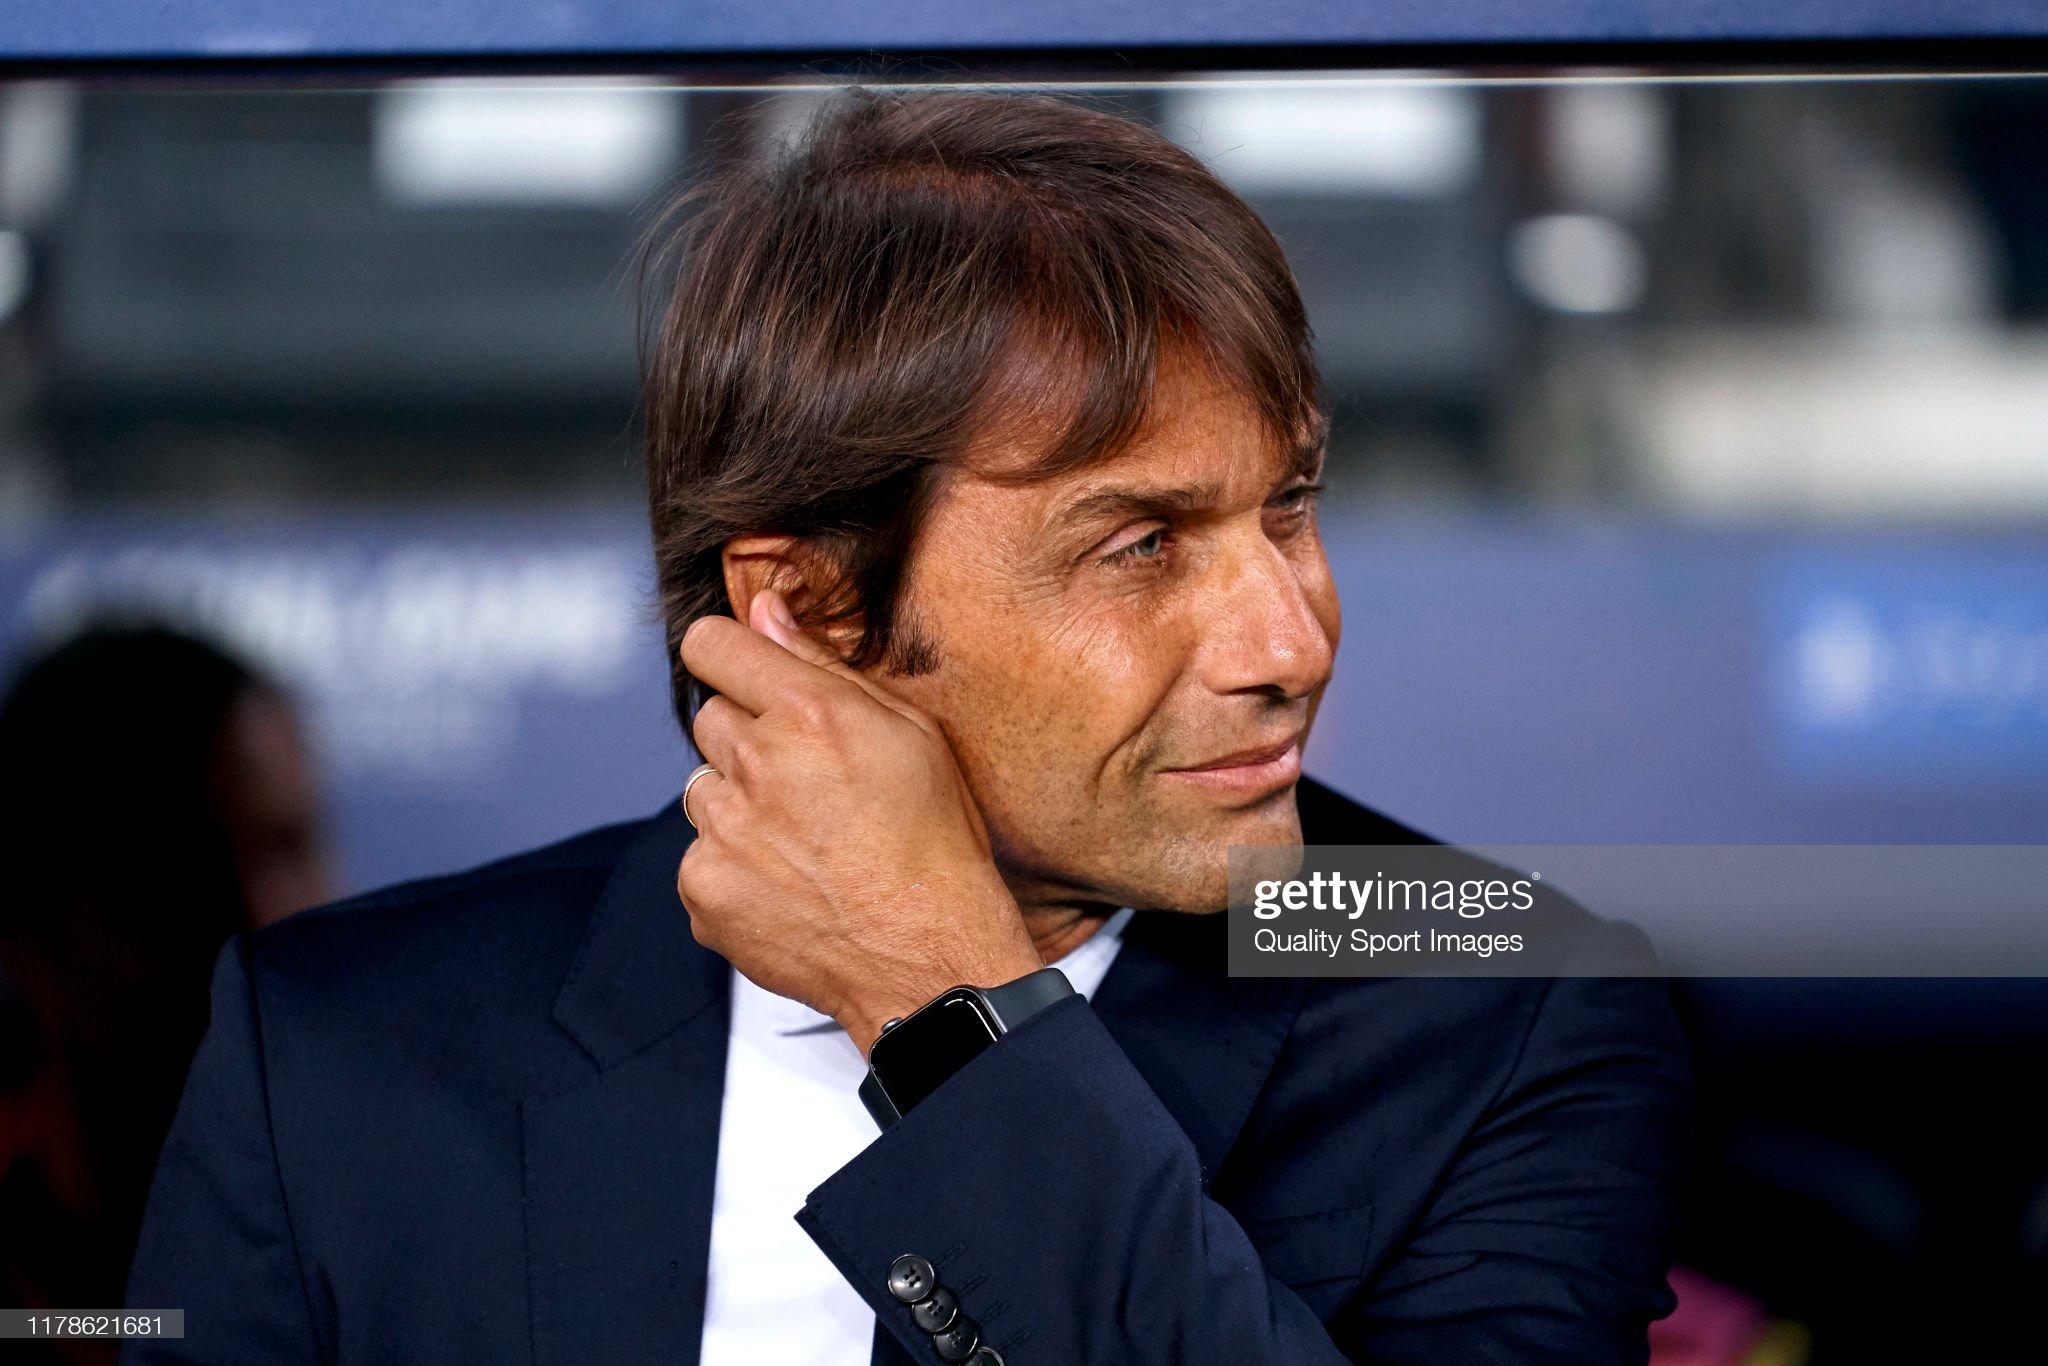 صور مباراة : برشلونة - إنتر 2-1 ( 02-10-2019 )  Antonio-conte-head-coach-of-inter-looks-on-prior-to-the-uefa-league-picture-id1178621681?s=2048x2048